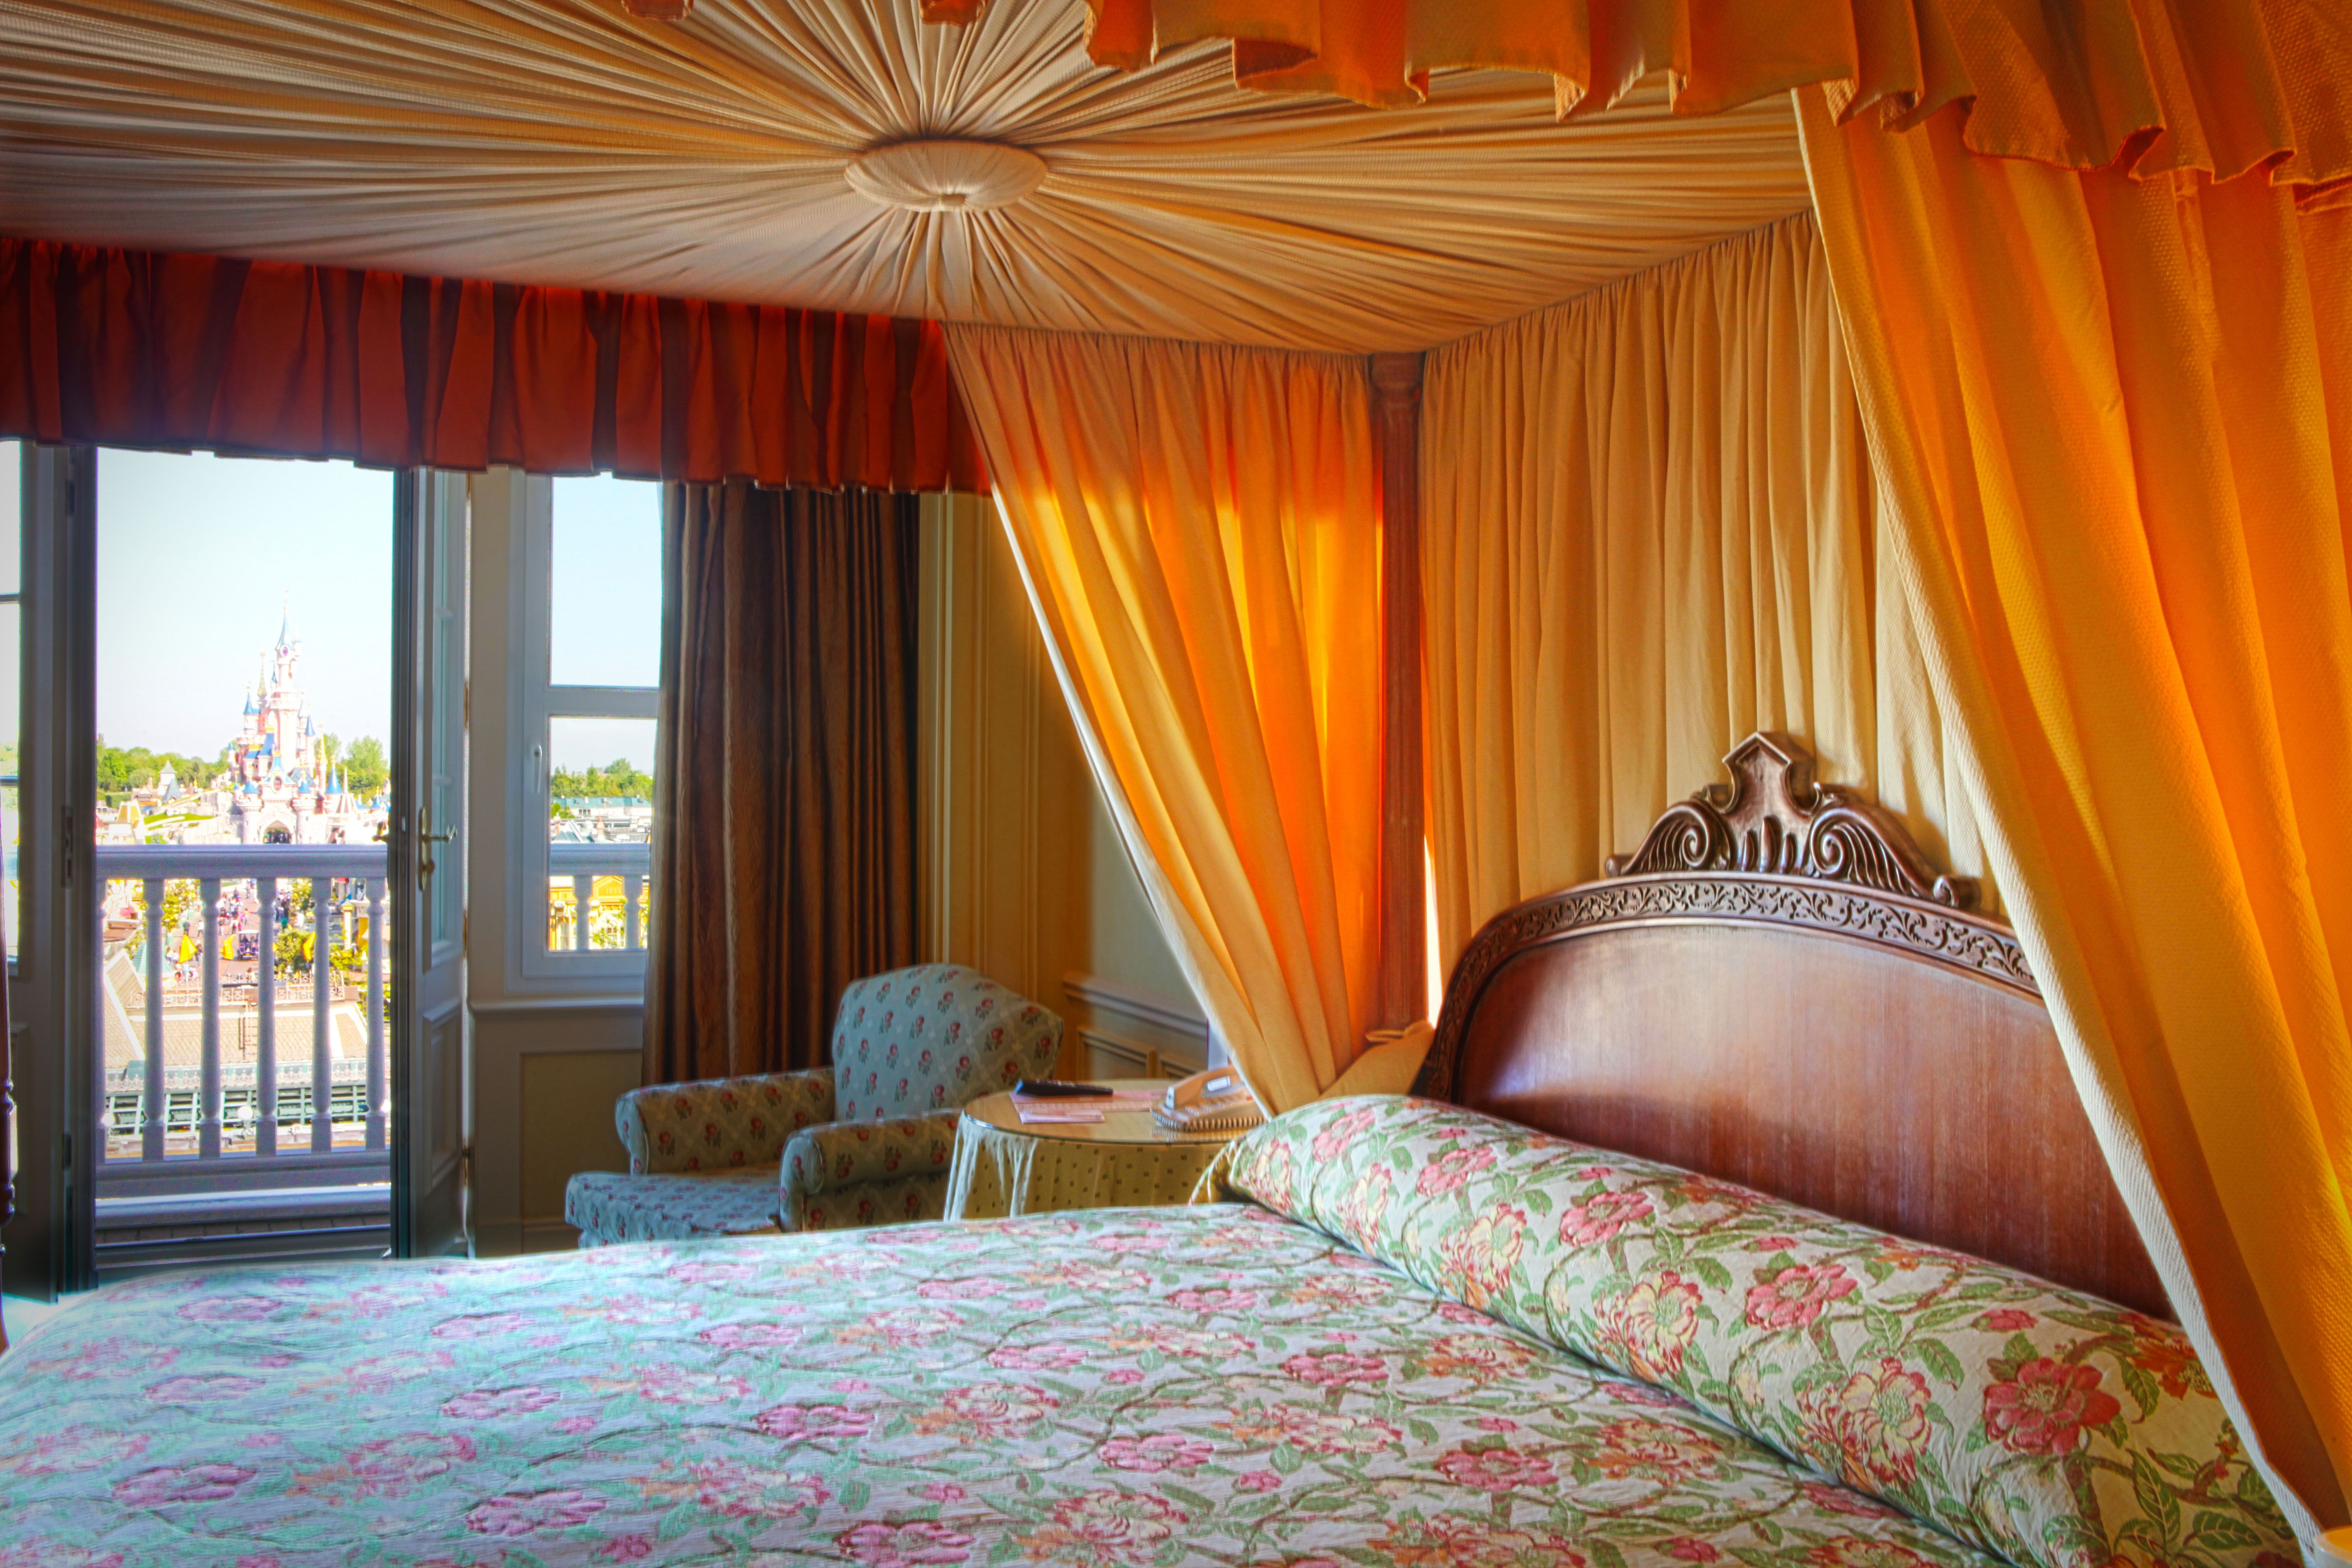 Disney Hotels Disneyland Hotel - Tinkerbell Suite